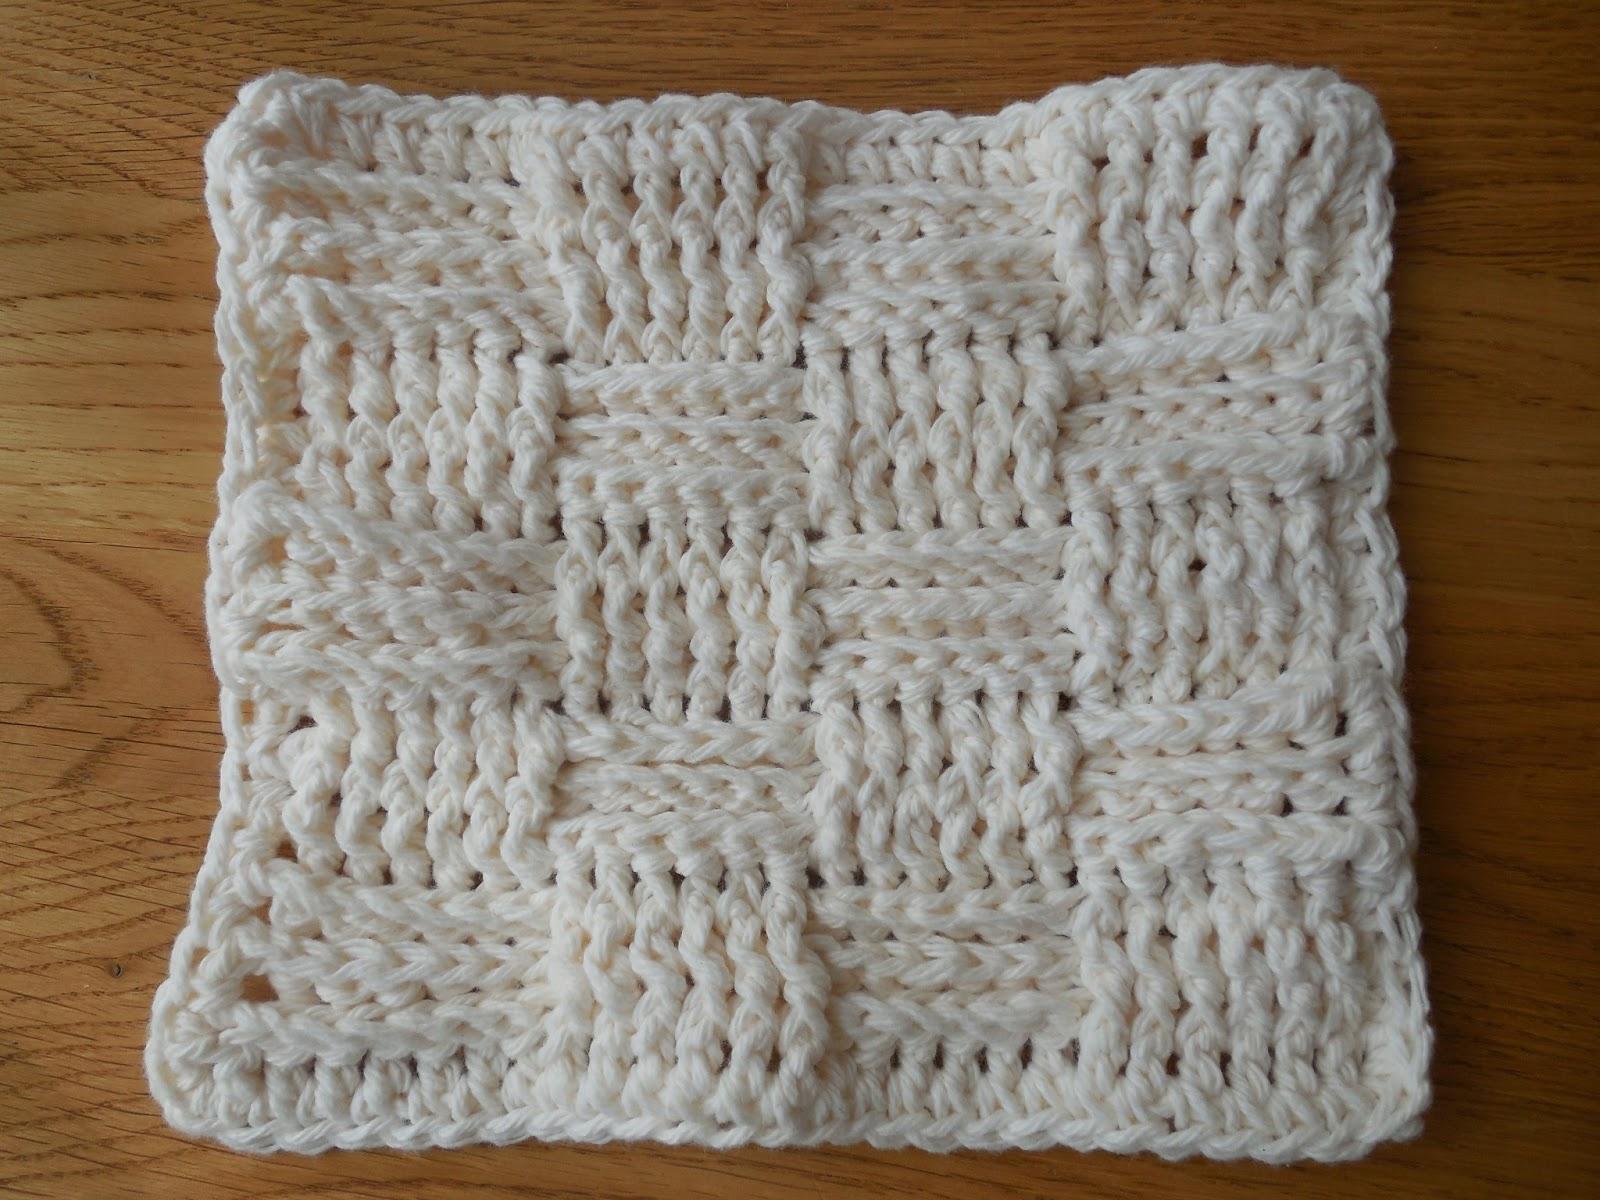 Knitting Pattern Basket Weave Dishcloth : Hooked On Handmade: Basket Weave Dishcloth